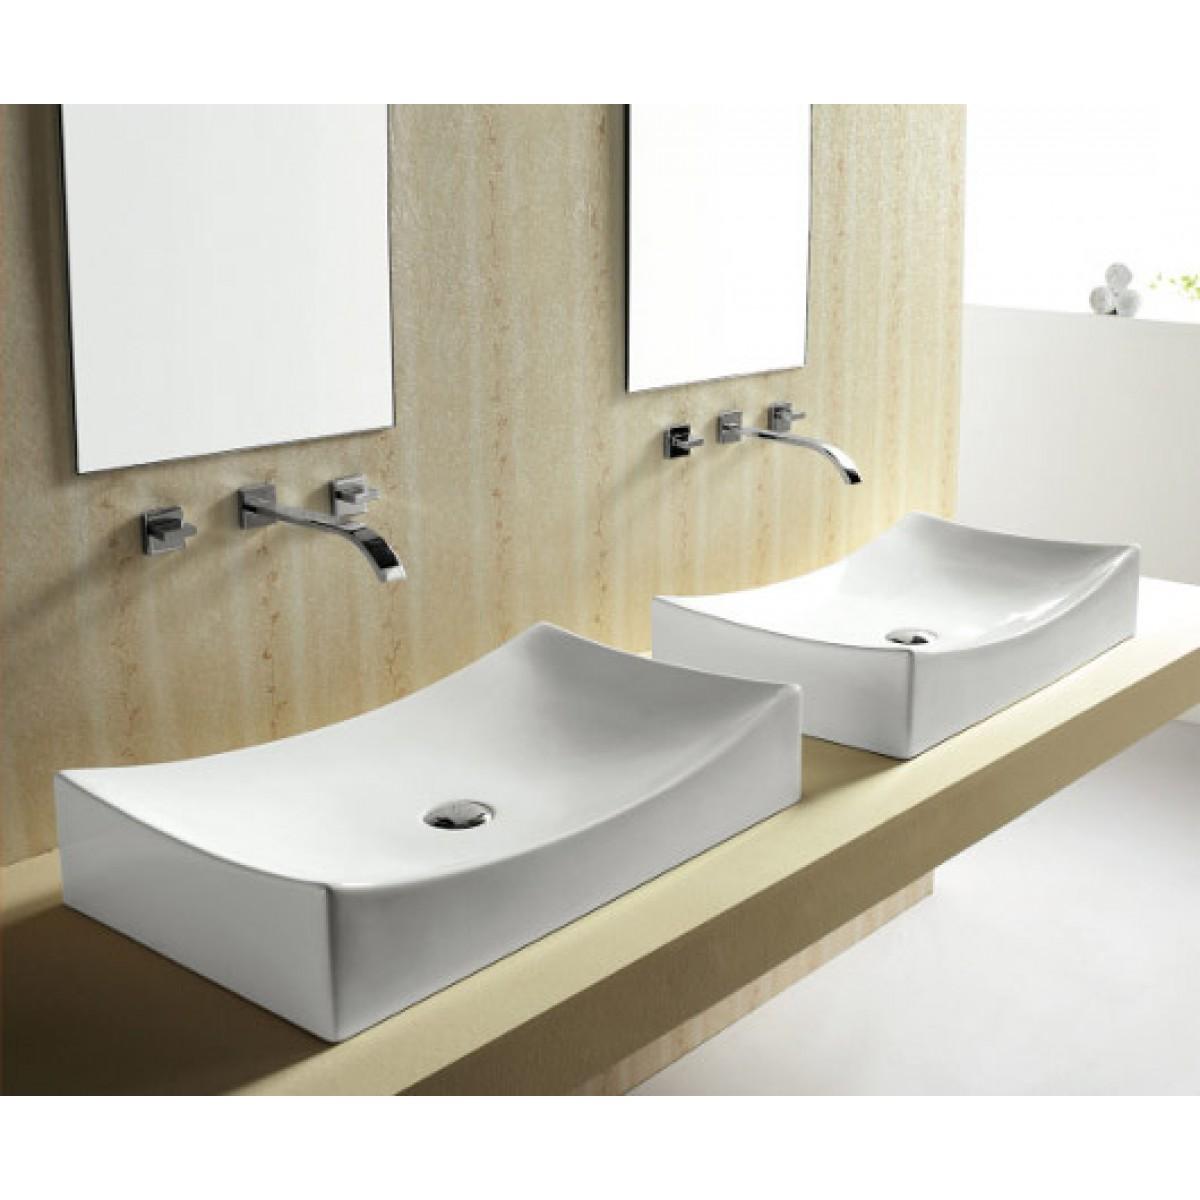 European Style Porcelain Ceramic Countertop Bathroom